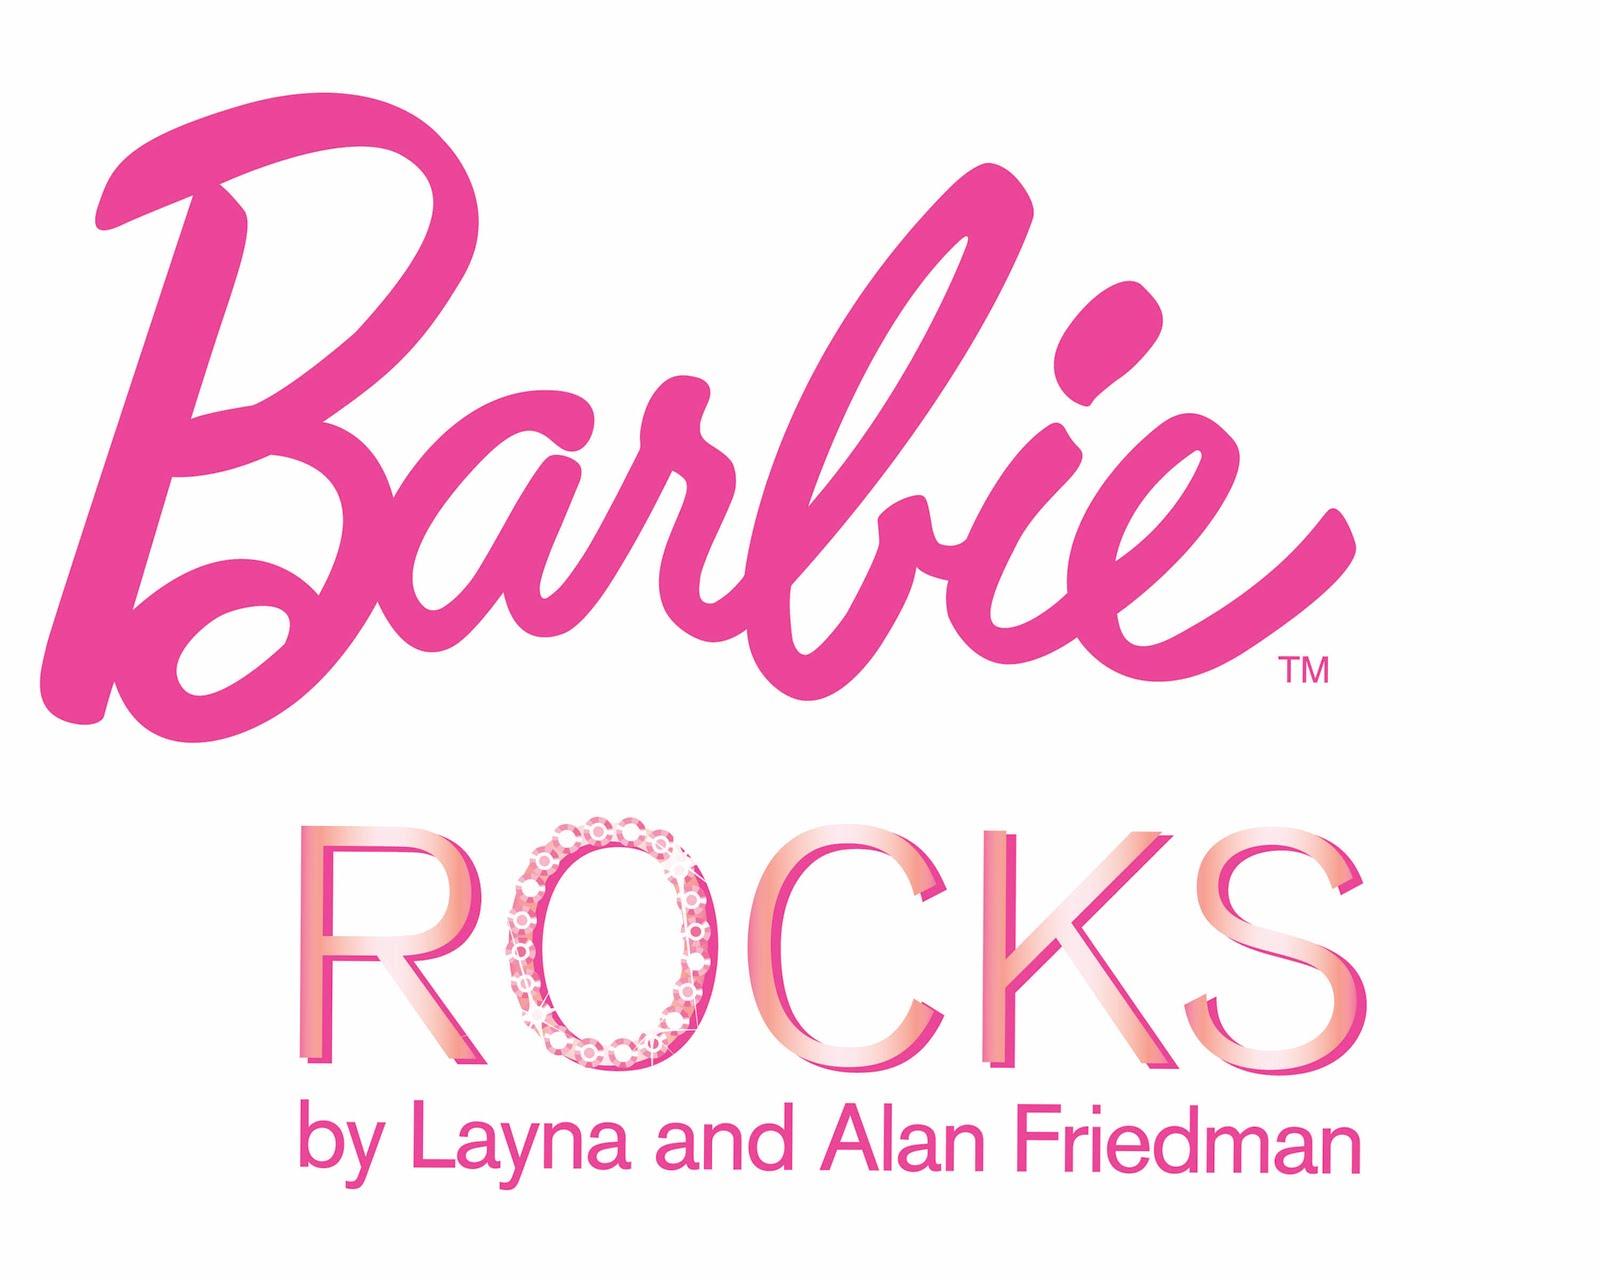 http://3.bp.blogspot.com/-0RVz2u2R5oA/TiYHSvsDsBI/AAAAAAAAAAU/6NZ_esBU0zE/s1600/Barbie%2BRocks%2BLogo%2B2011%2BDarker.jpg